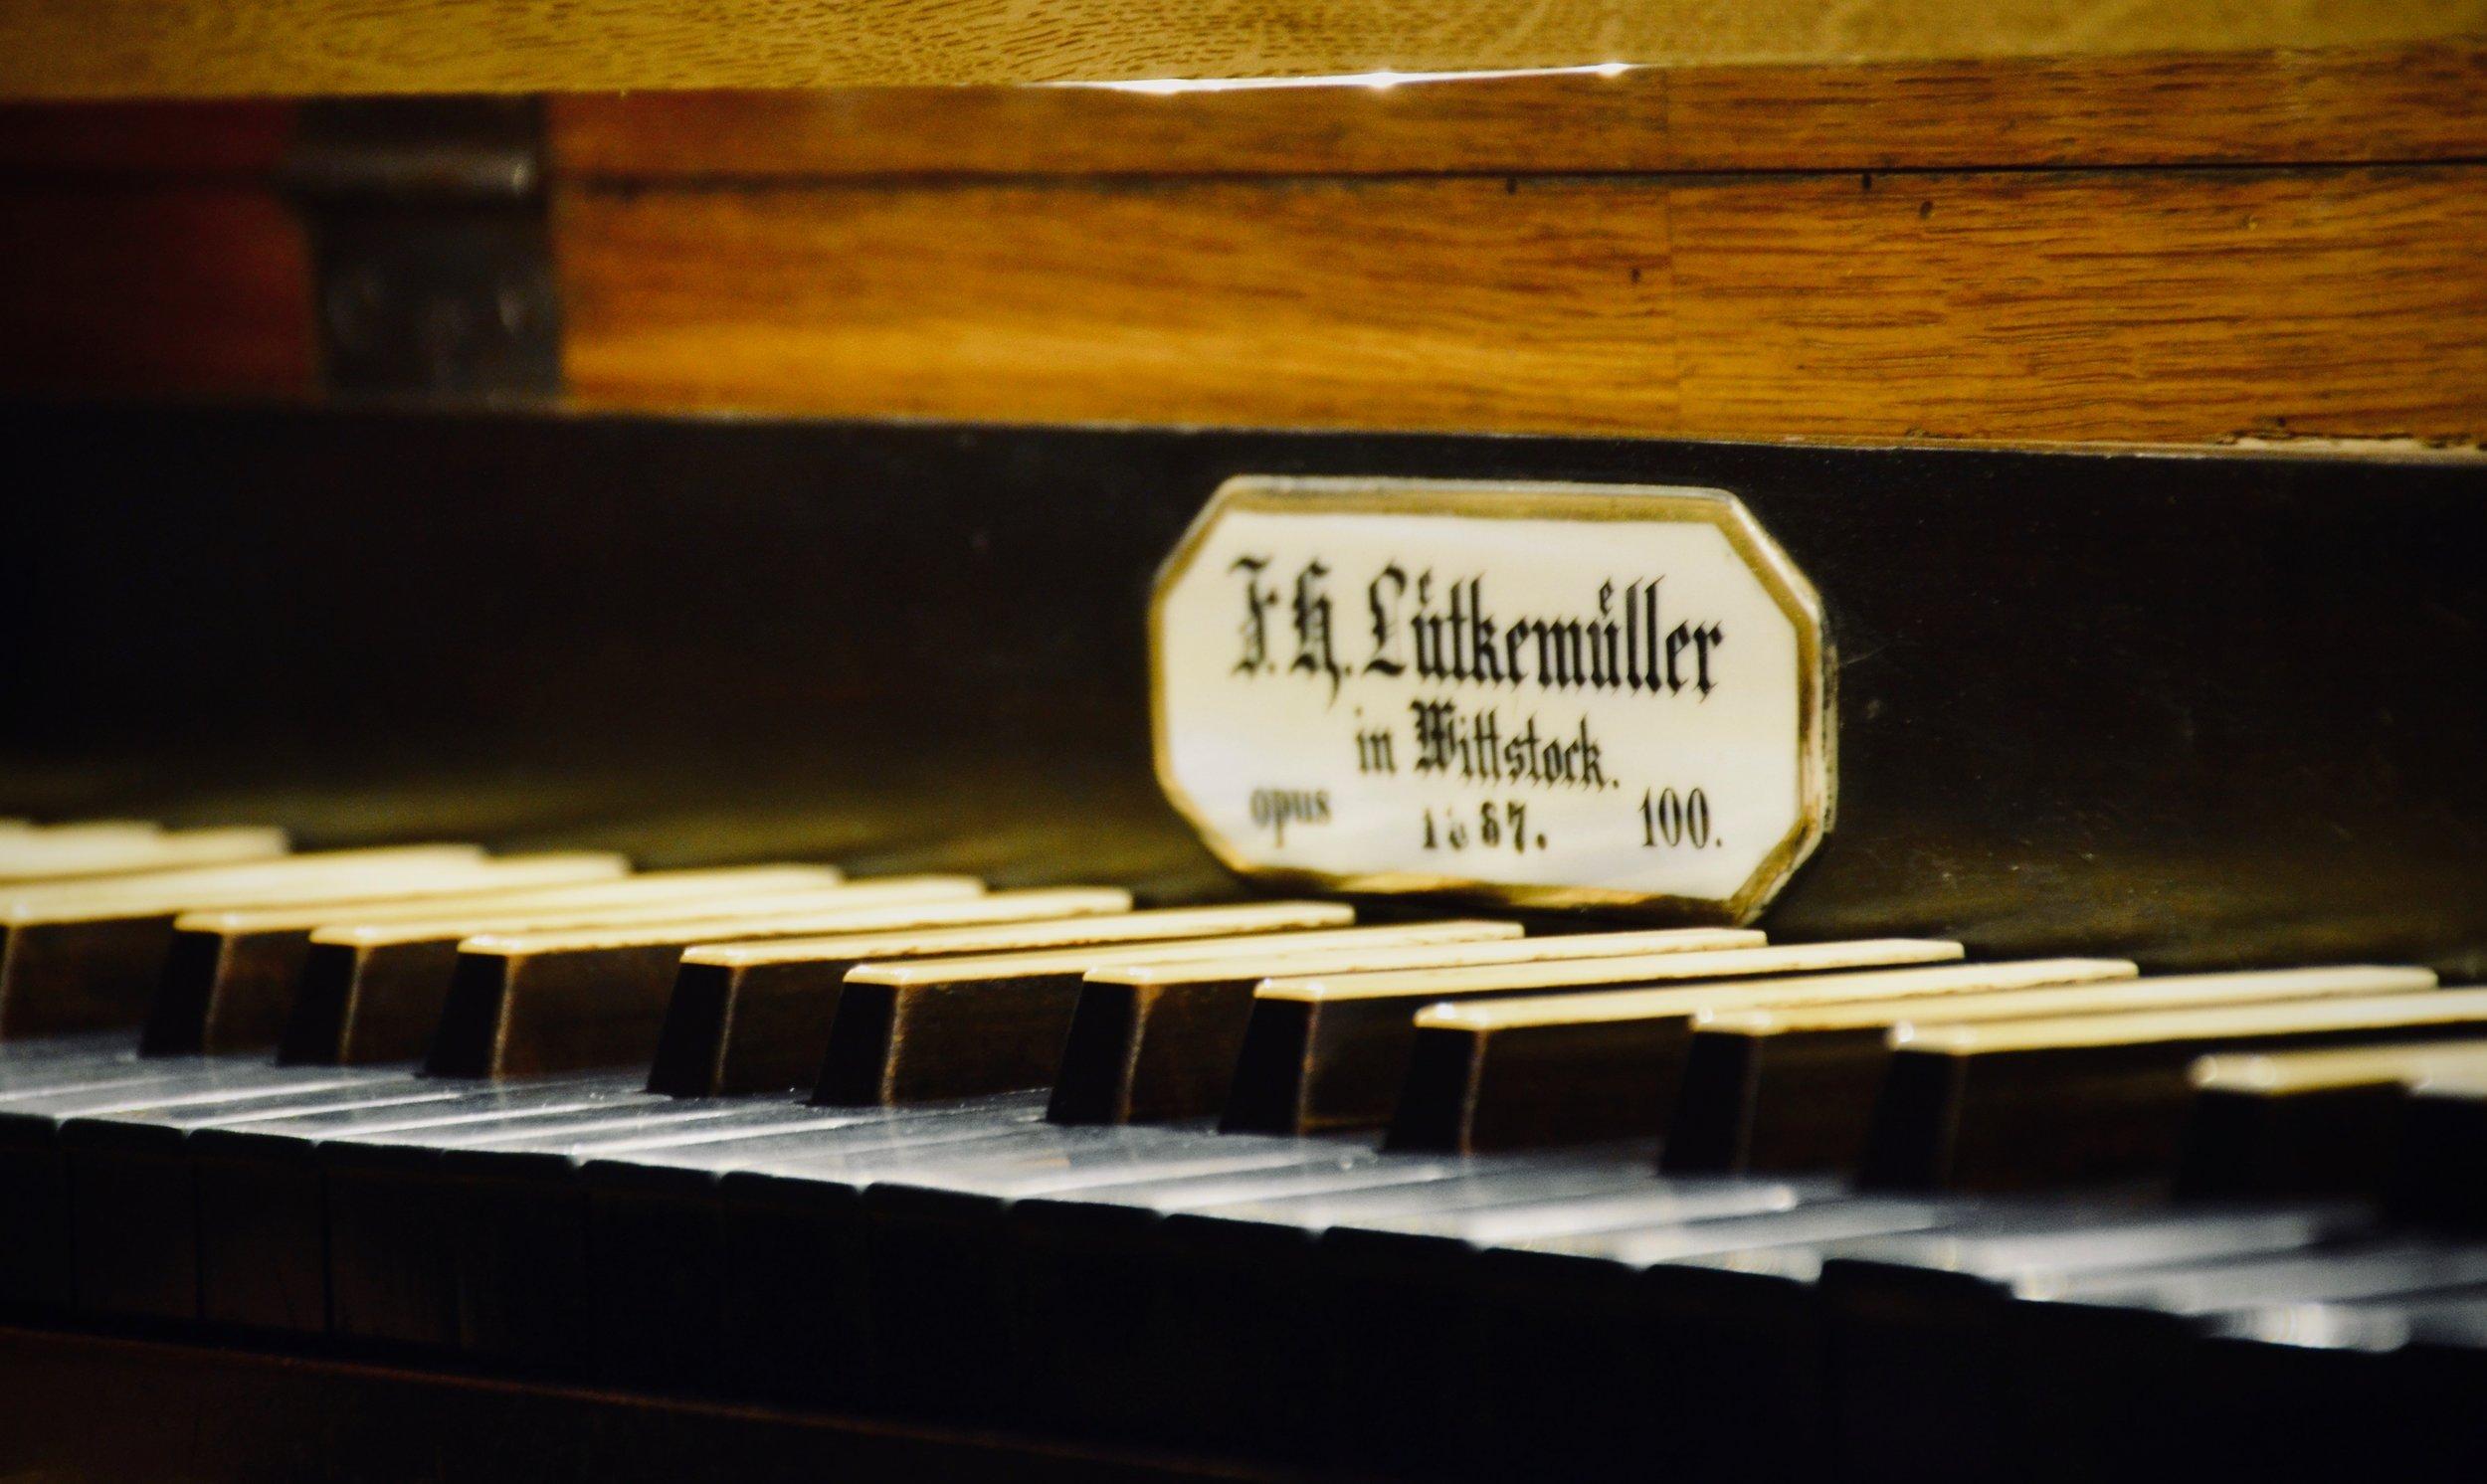 Console detail, 1867 Lütkemüller Organ, St. Petri-Kirche, Seehausen.